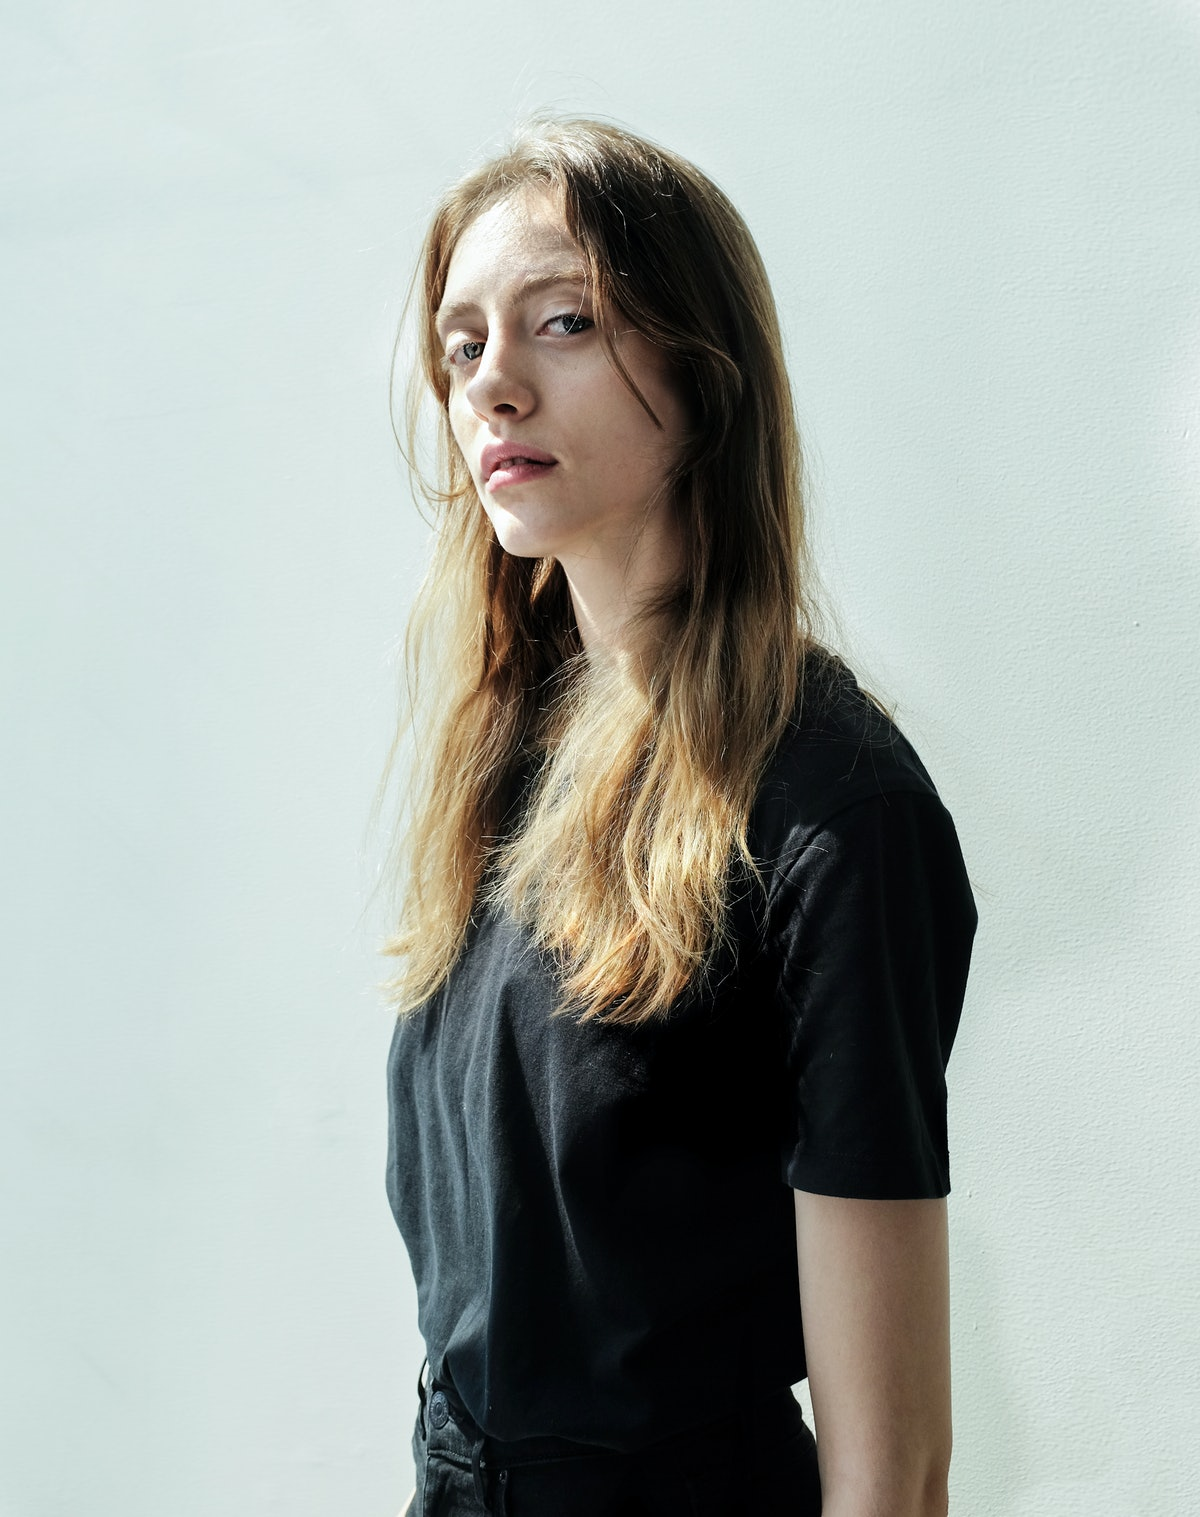 Lia Pavlova